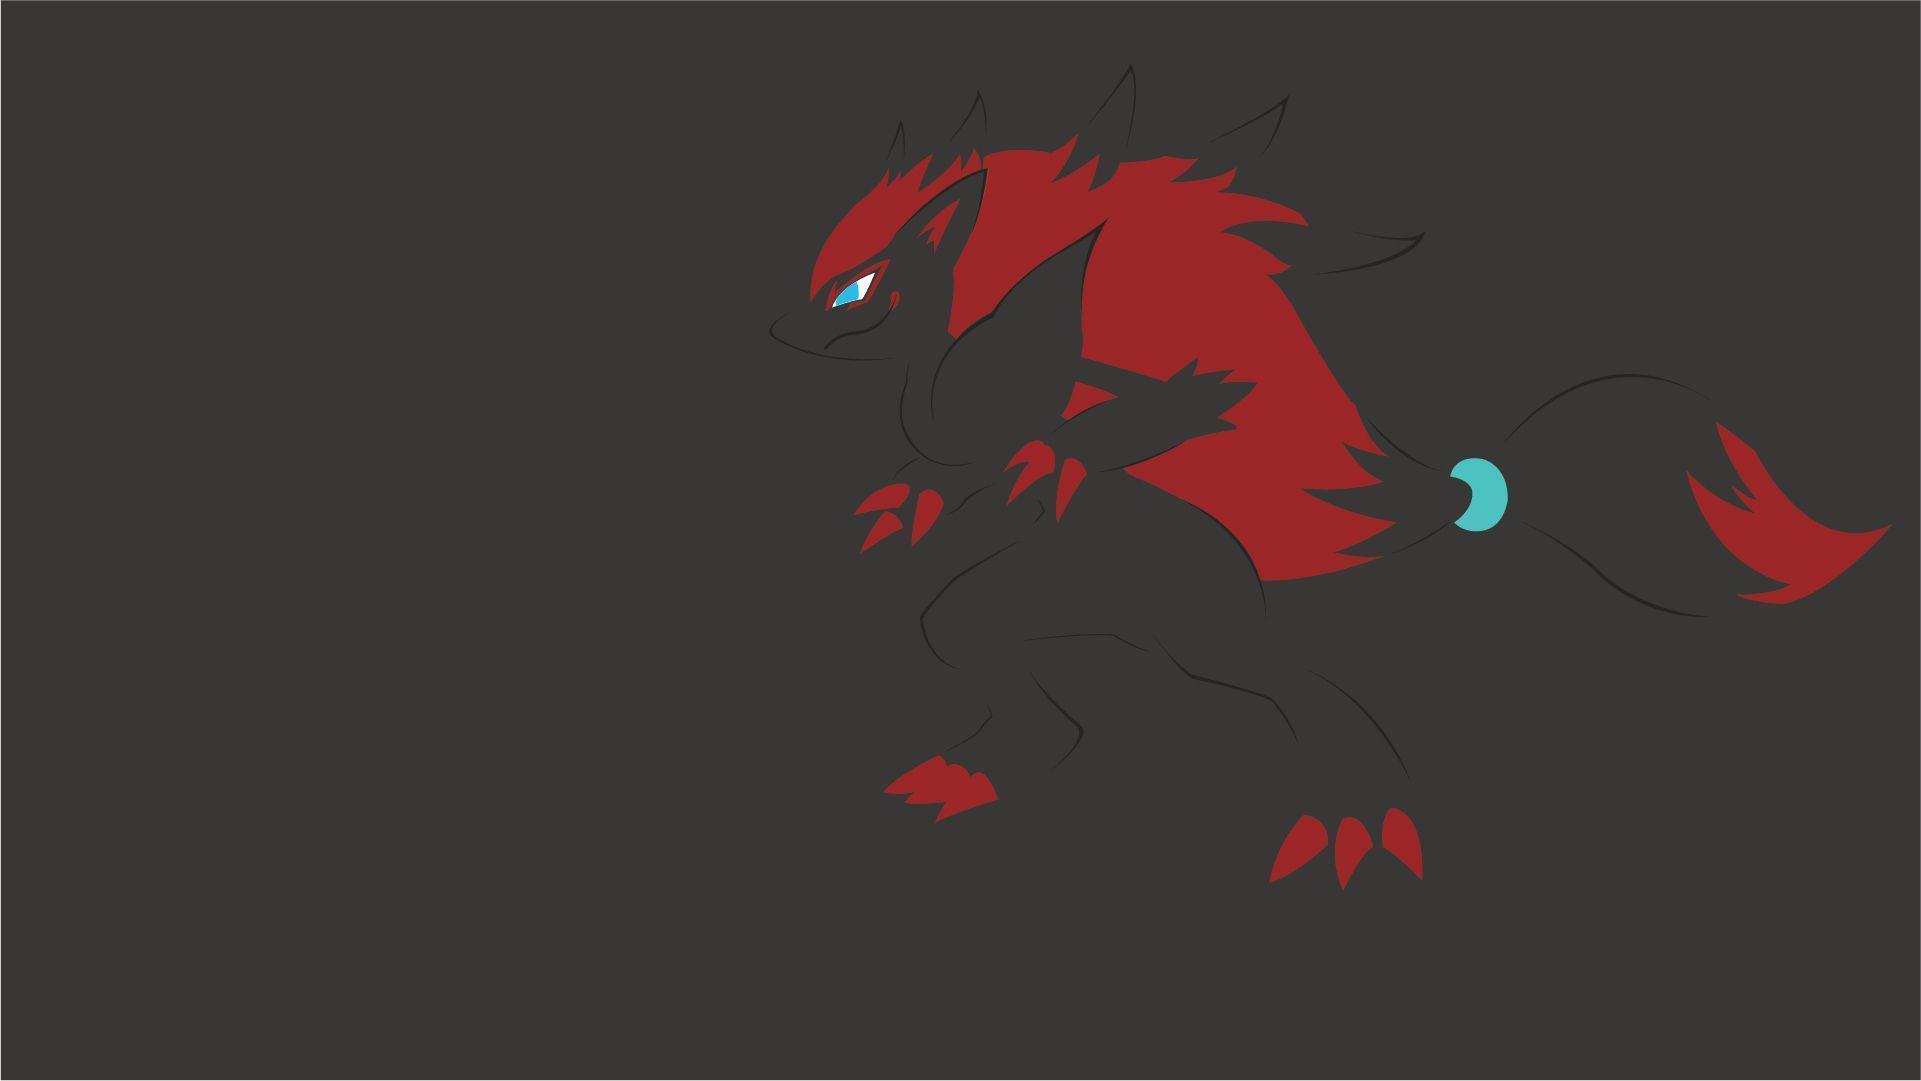 Zoroark Wallpaper - CHGLand.info